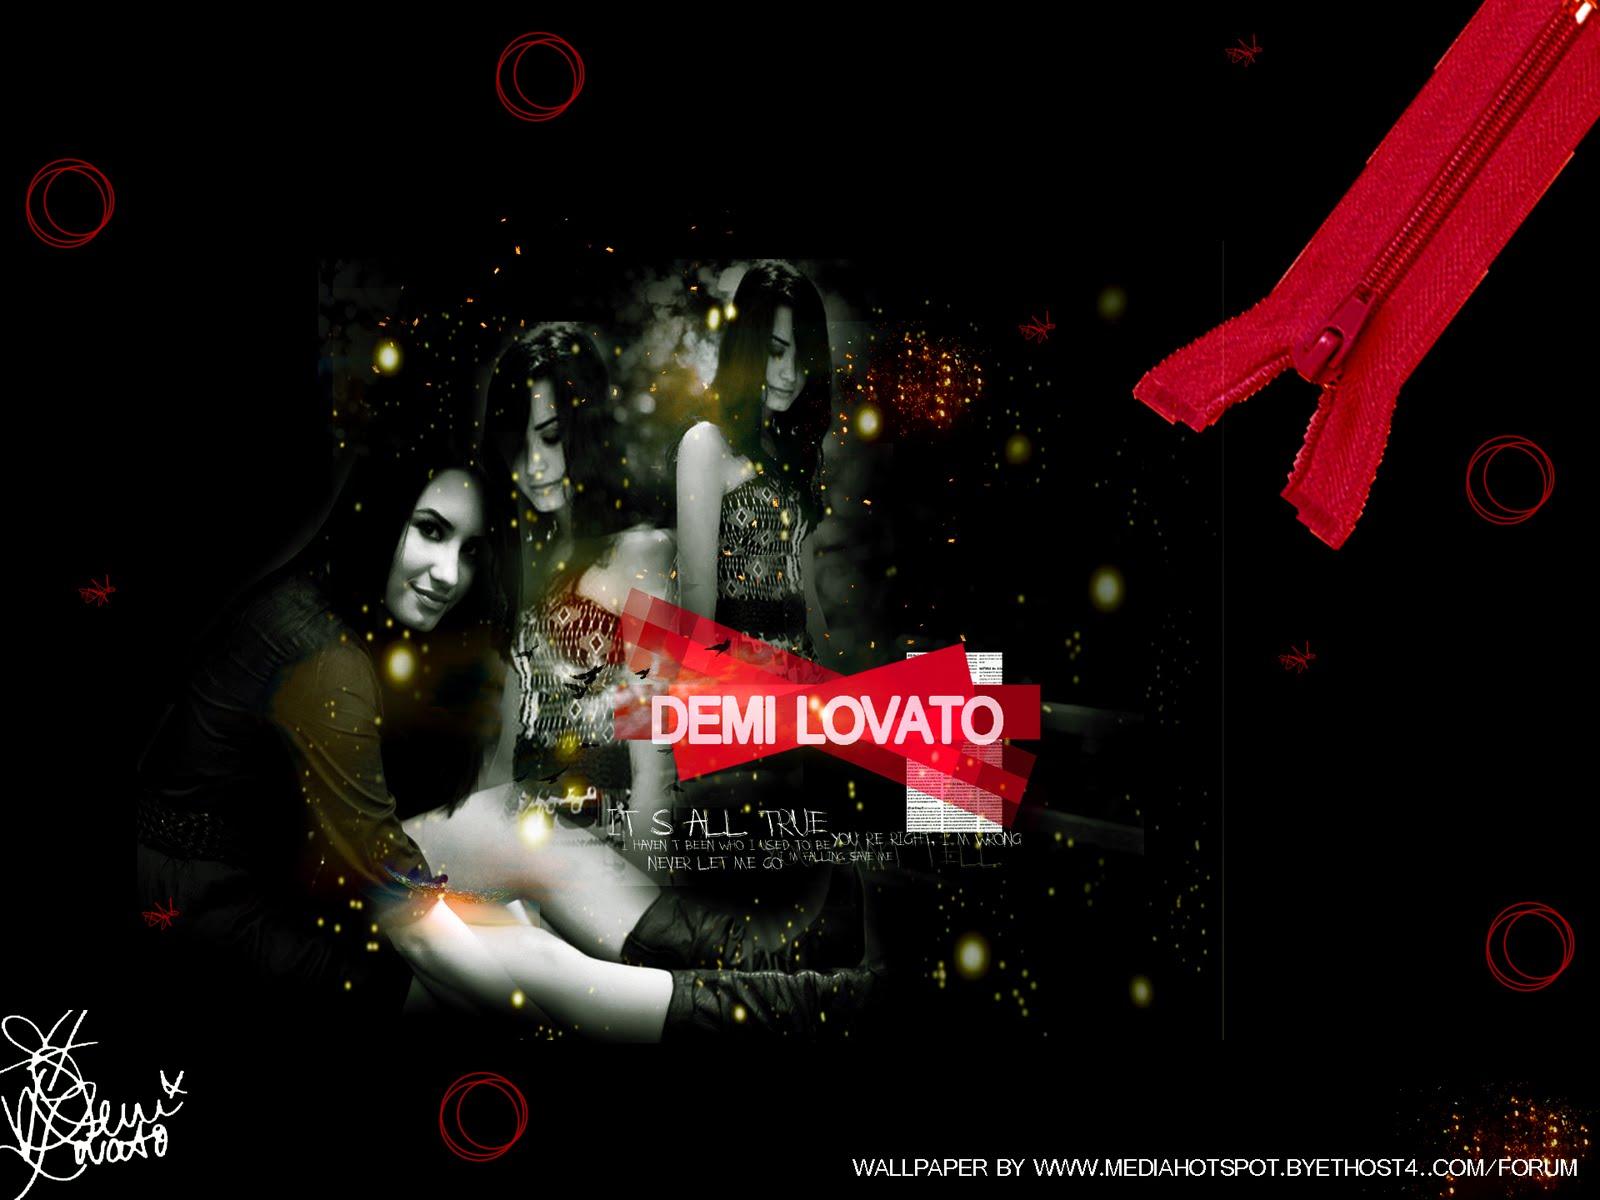 http://3.bp.blogspot.com/_Ip1Ozo4yGWQ/SxGsc38MnEI/AAAAAAAACTU/Z9lyDvseIPI/S1600-R/Demi_Lovato_Wallpaper_by_superstarx.jpg